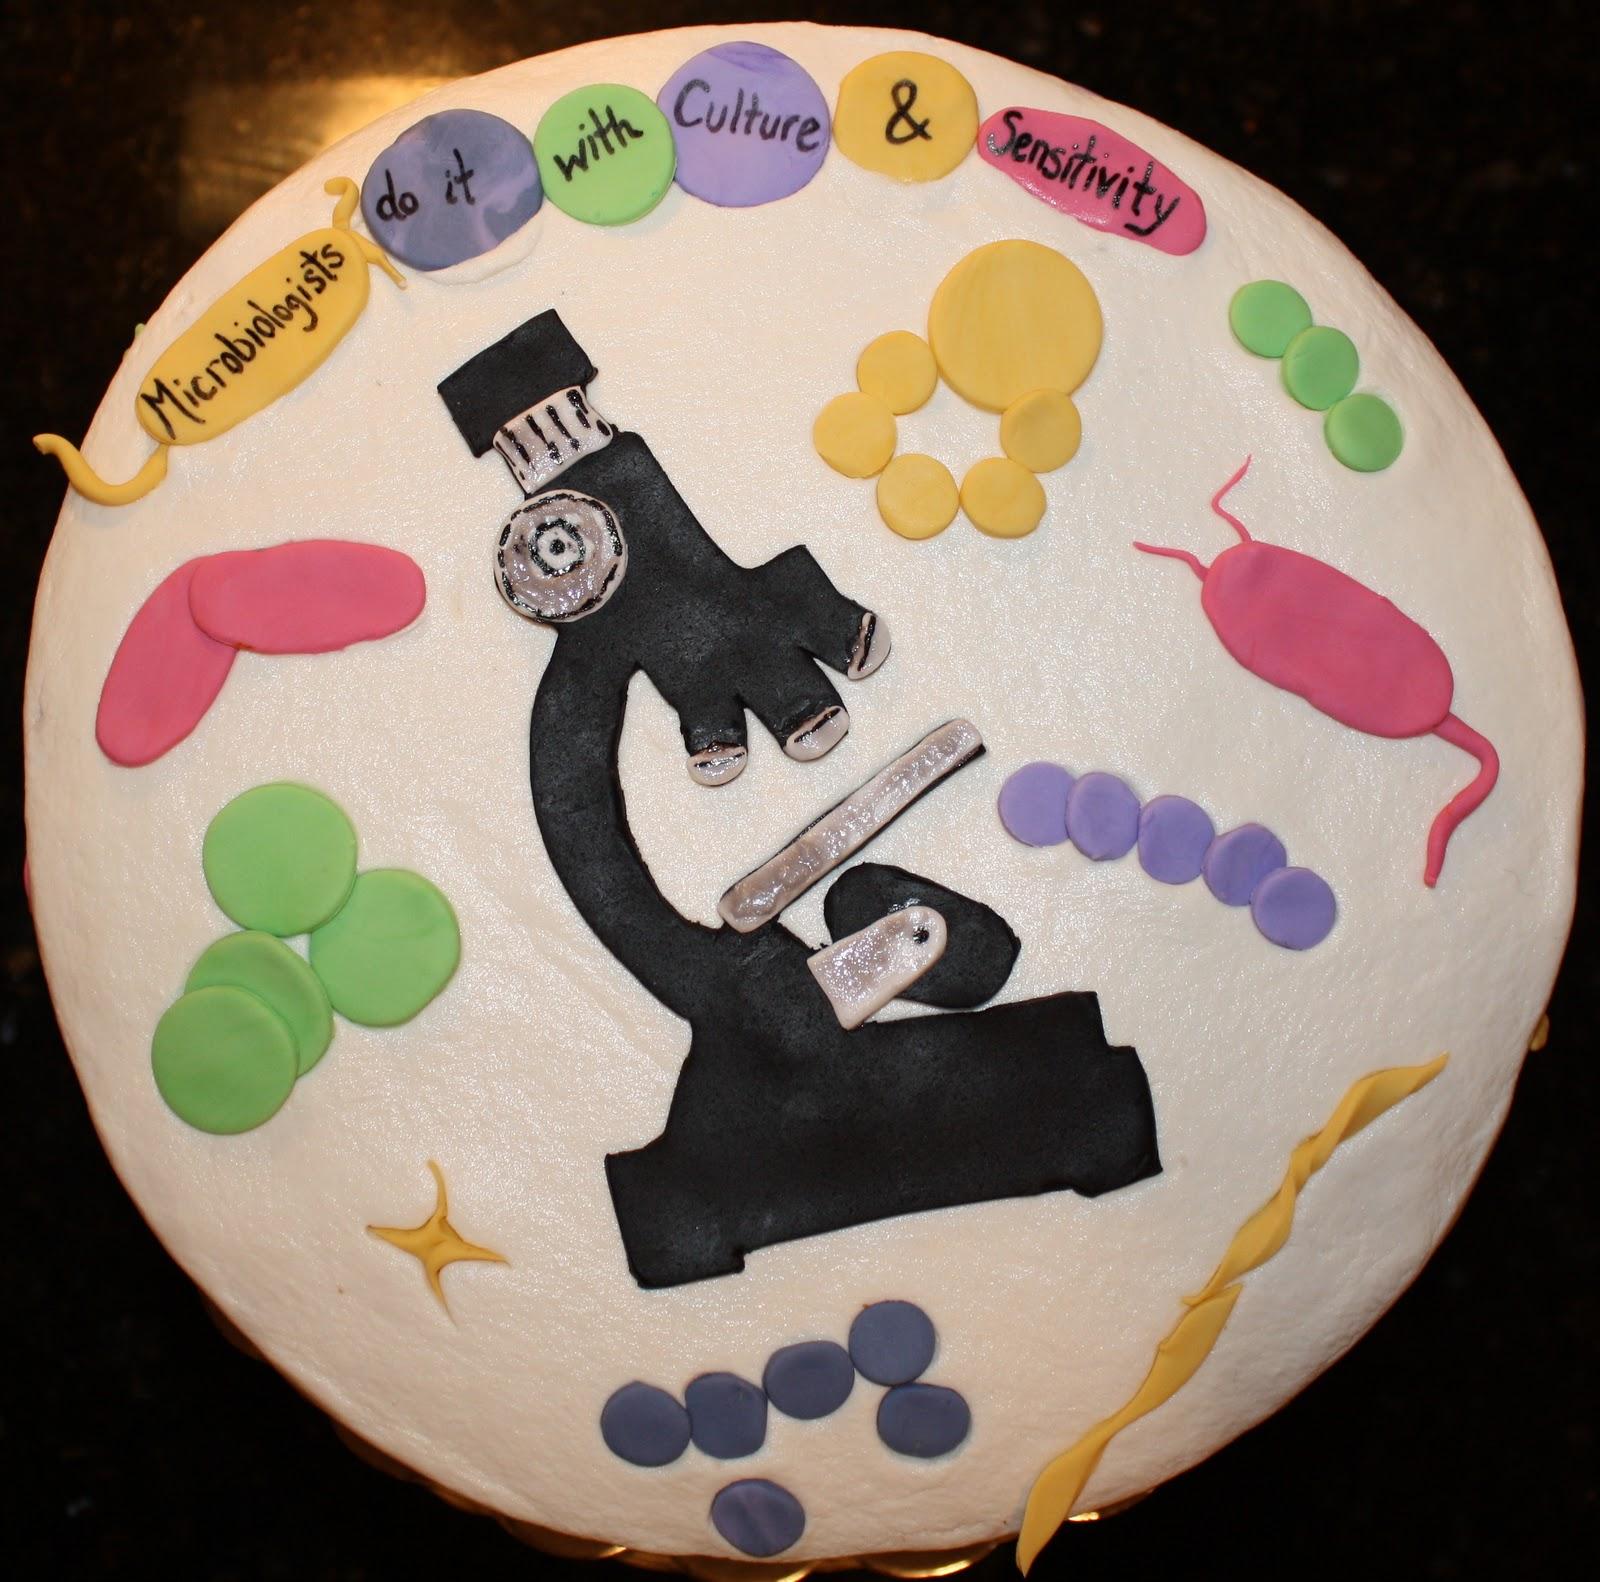 Microbiology cake